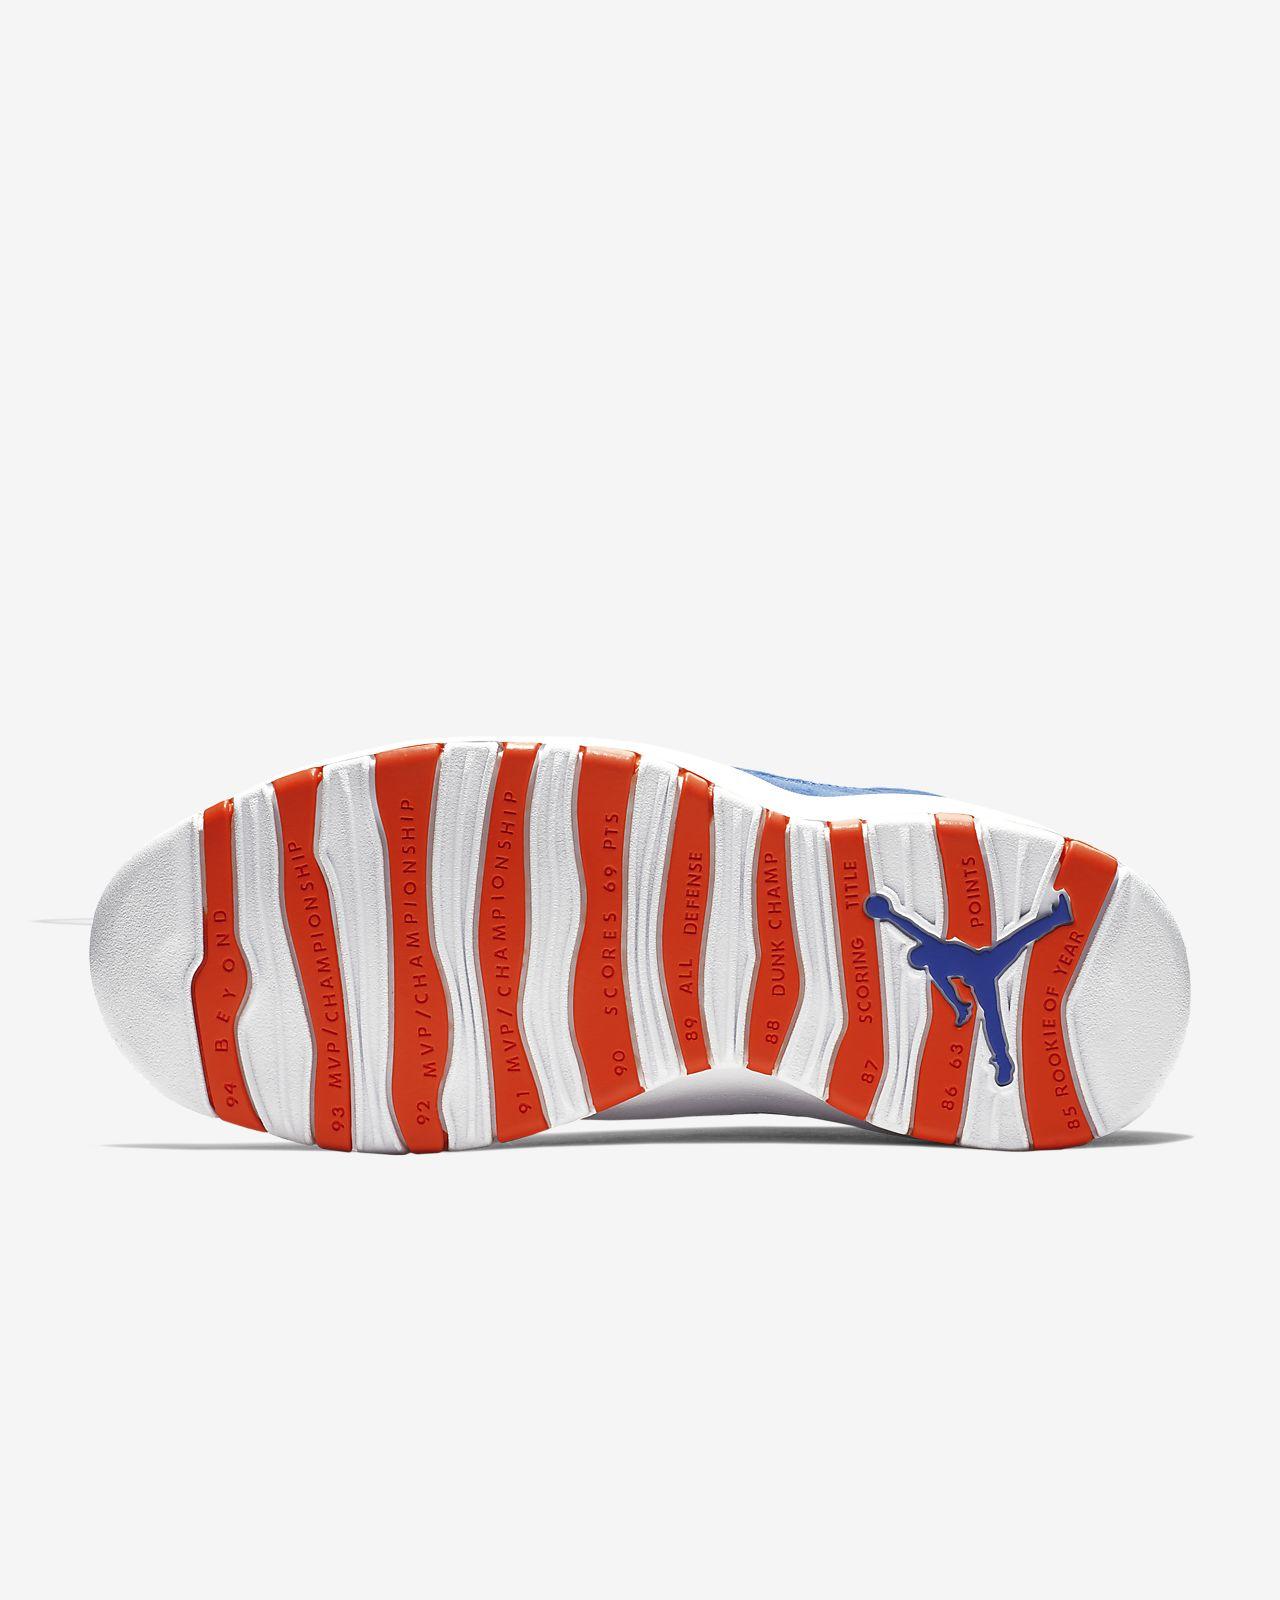 online store 94da9 df22d ... Air Jordan 10 Retro Men s Shoe